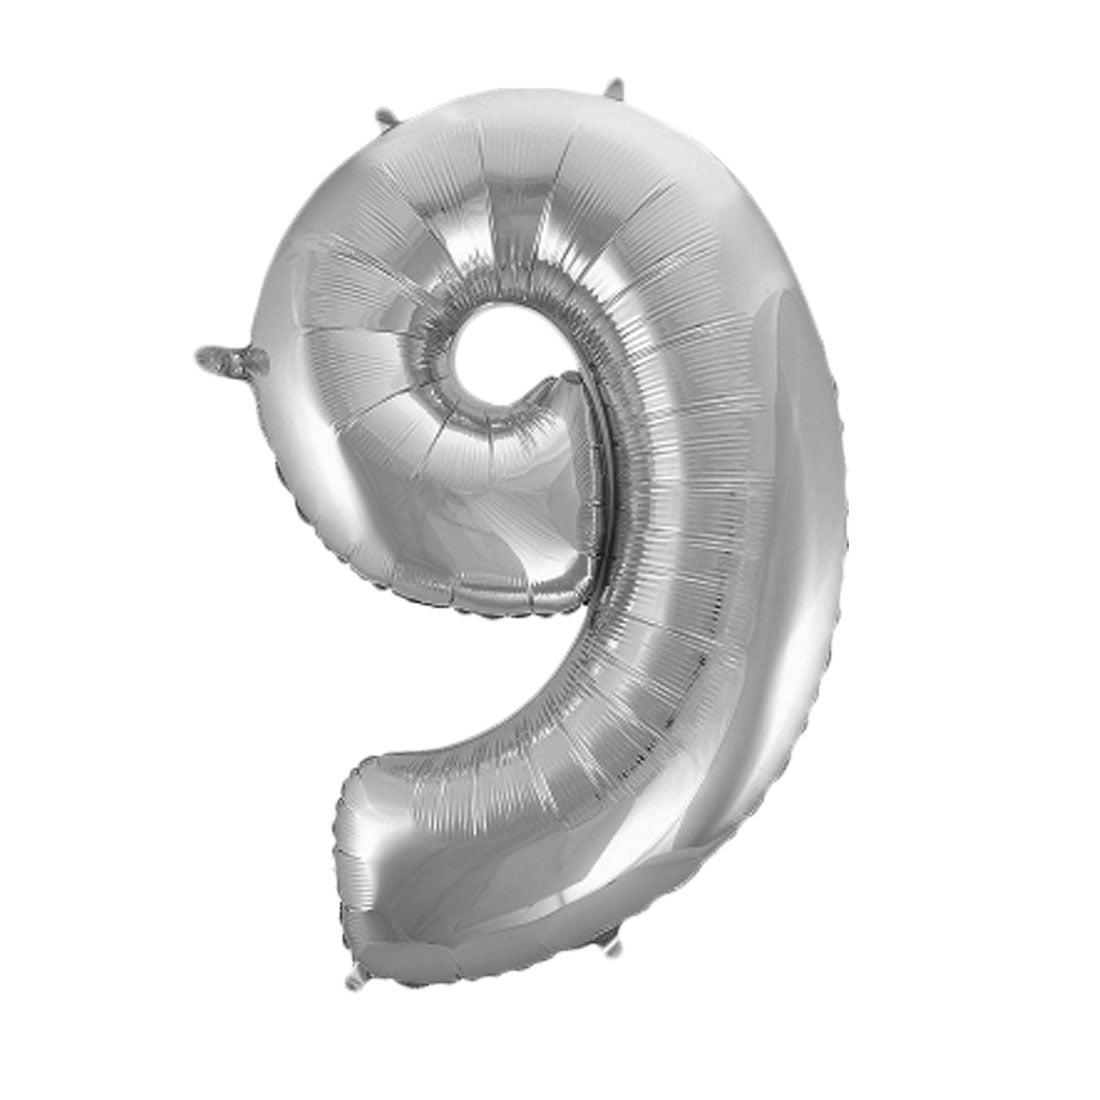 "Unique Bargains Foil Number 9 Shape Helium Balloon Birthday Wedding Decor Silver Tone 30"""